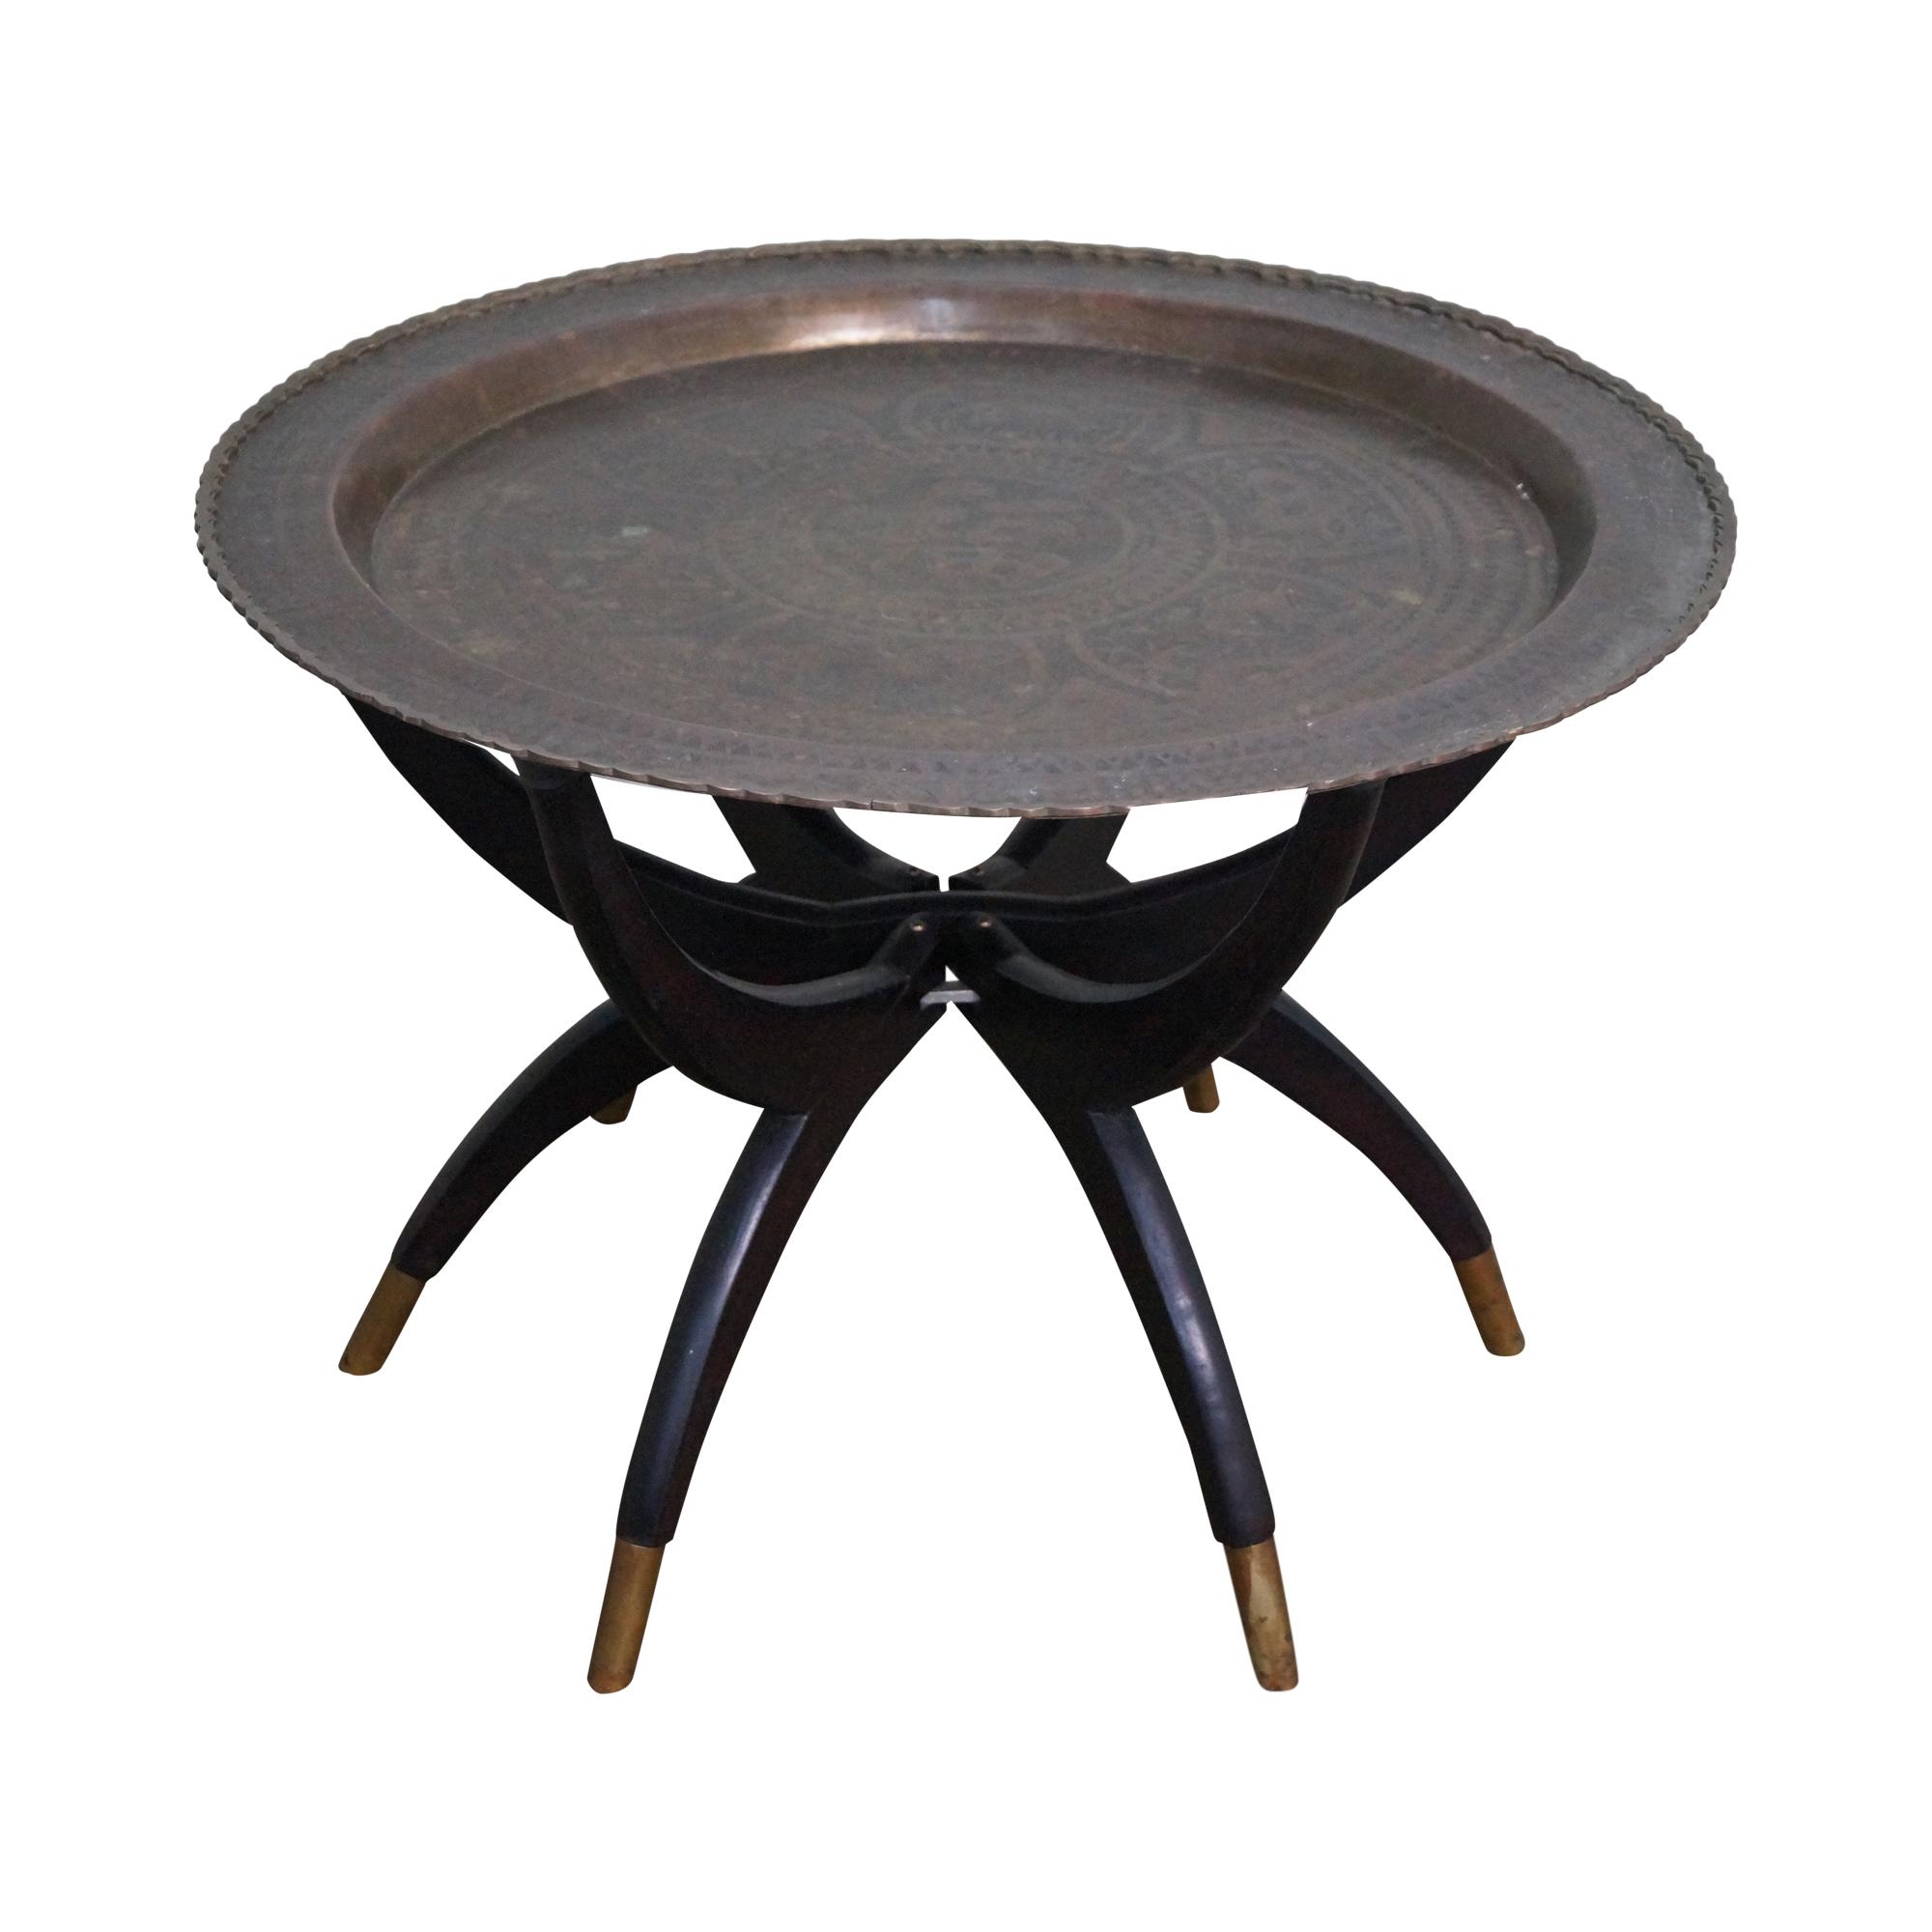 Coffee Table Tray Ebay: Asian Brass Tray Top Folding Coffee Table